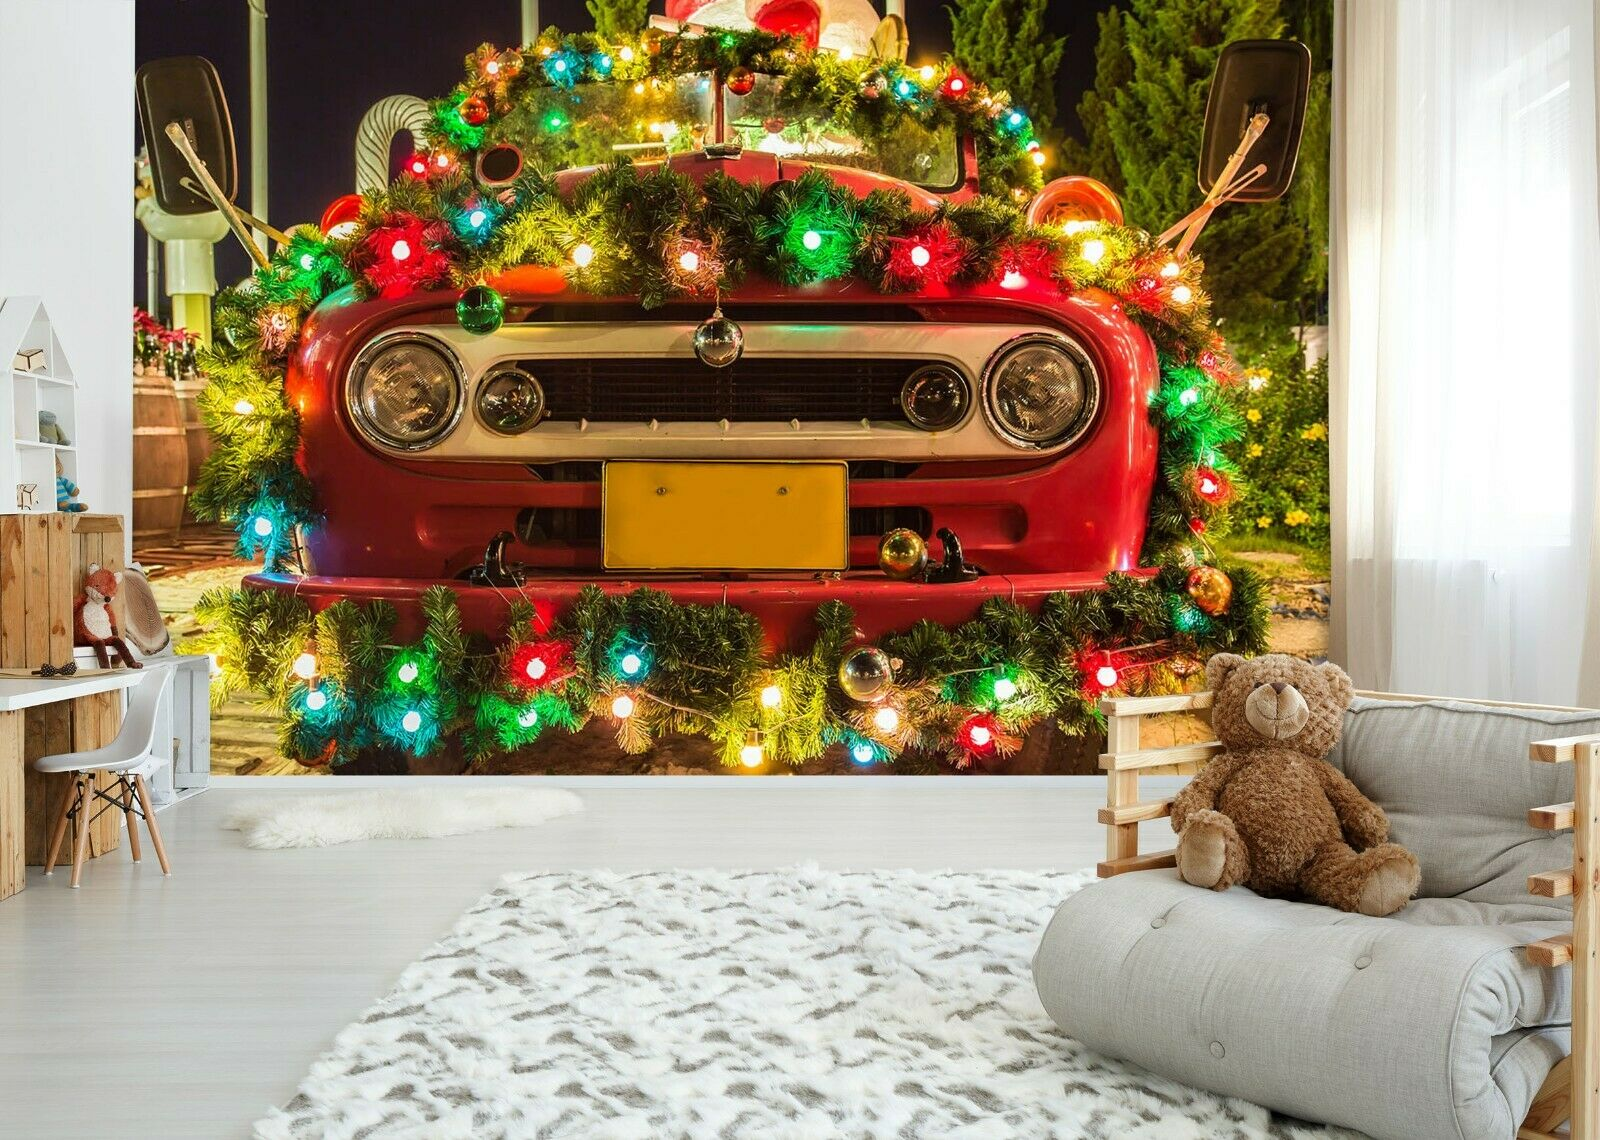 3D Weihnachtsrotes Auto O52 Auto Tapete Wandbild Selbstklebend Abnehmbare An